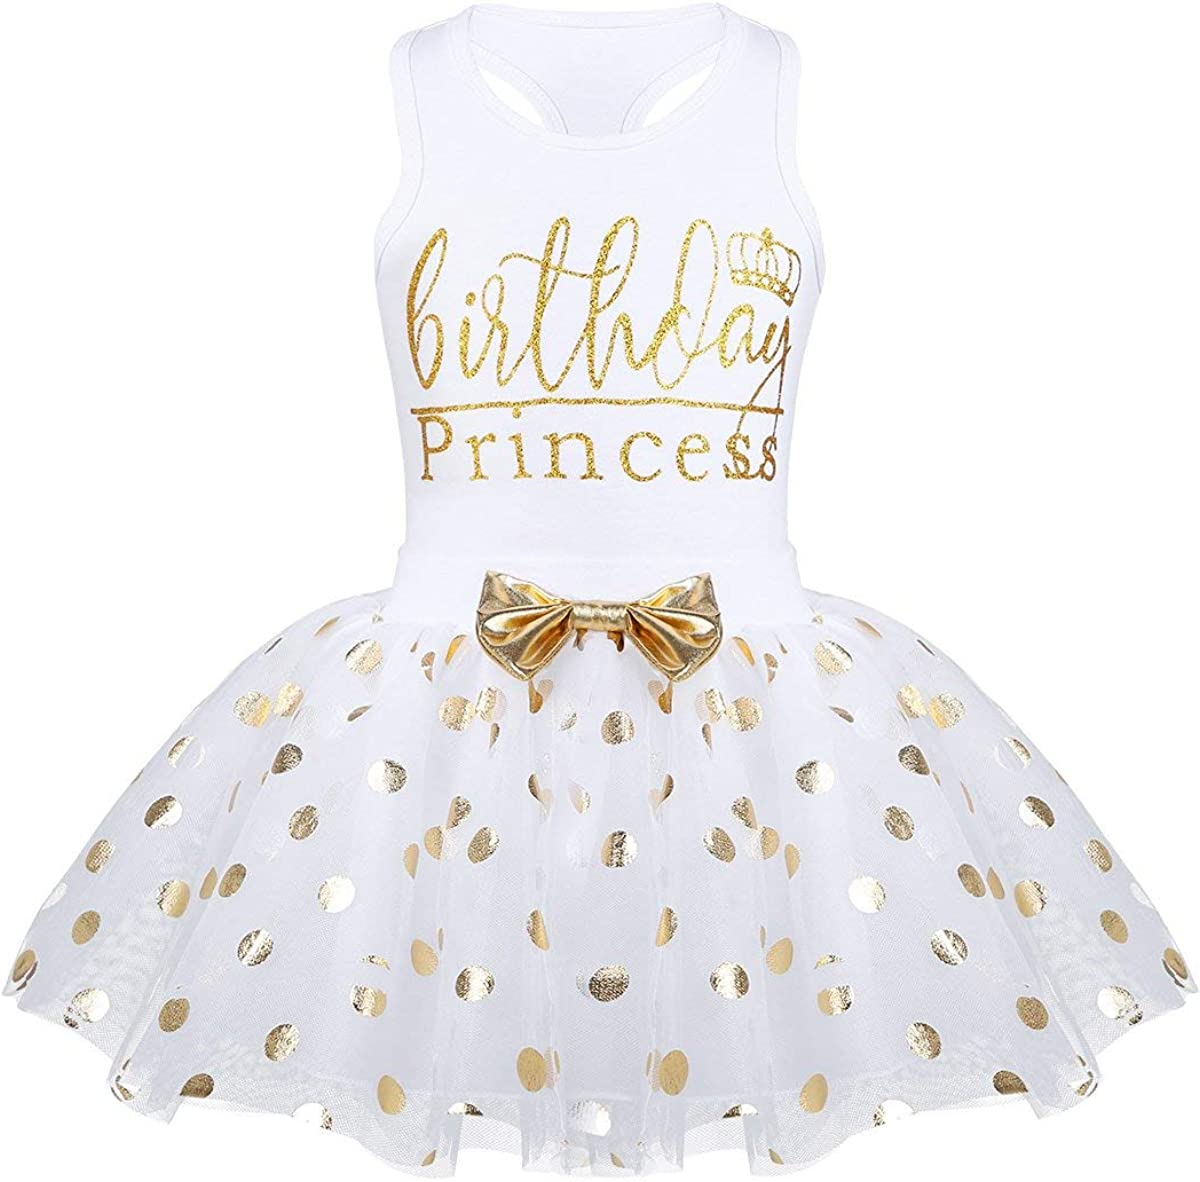 Toddler Kids Baby Girl's Birthday Outfits Princess Vest Sleeveless Shirt Mesh Tutu Skirt Set